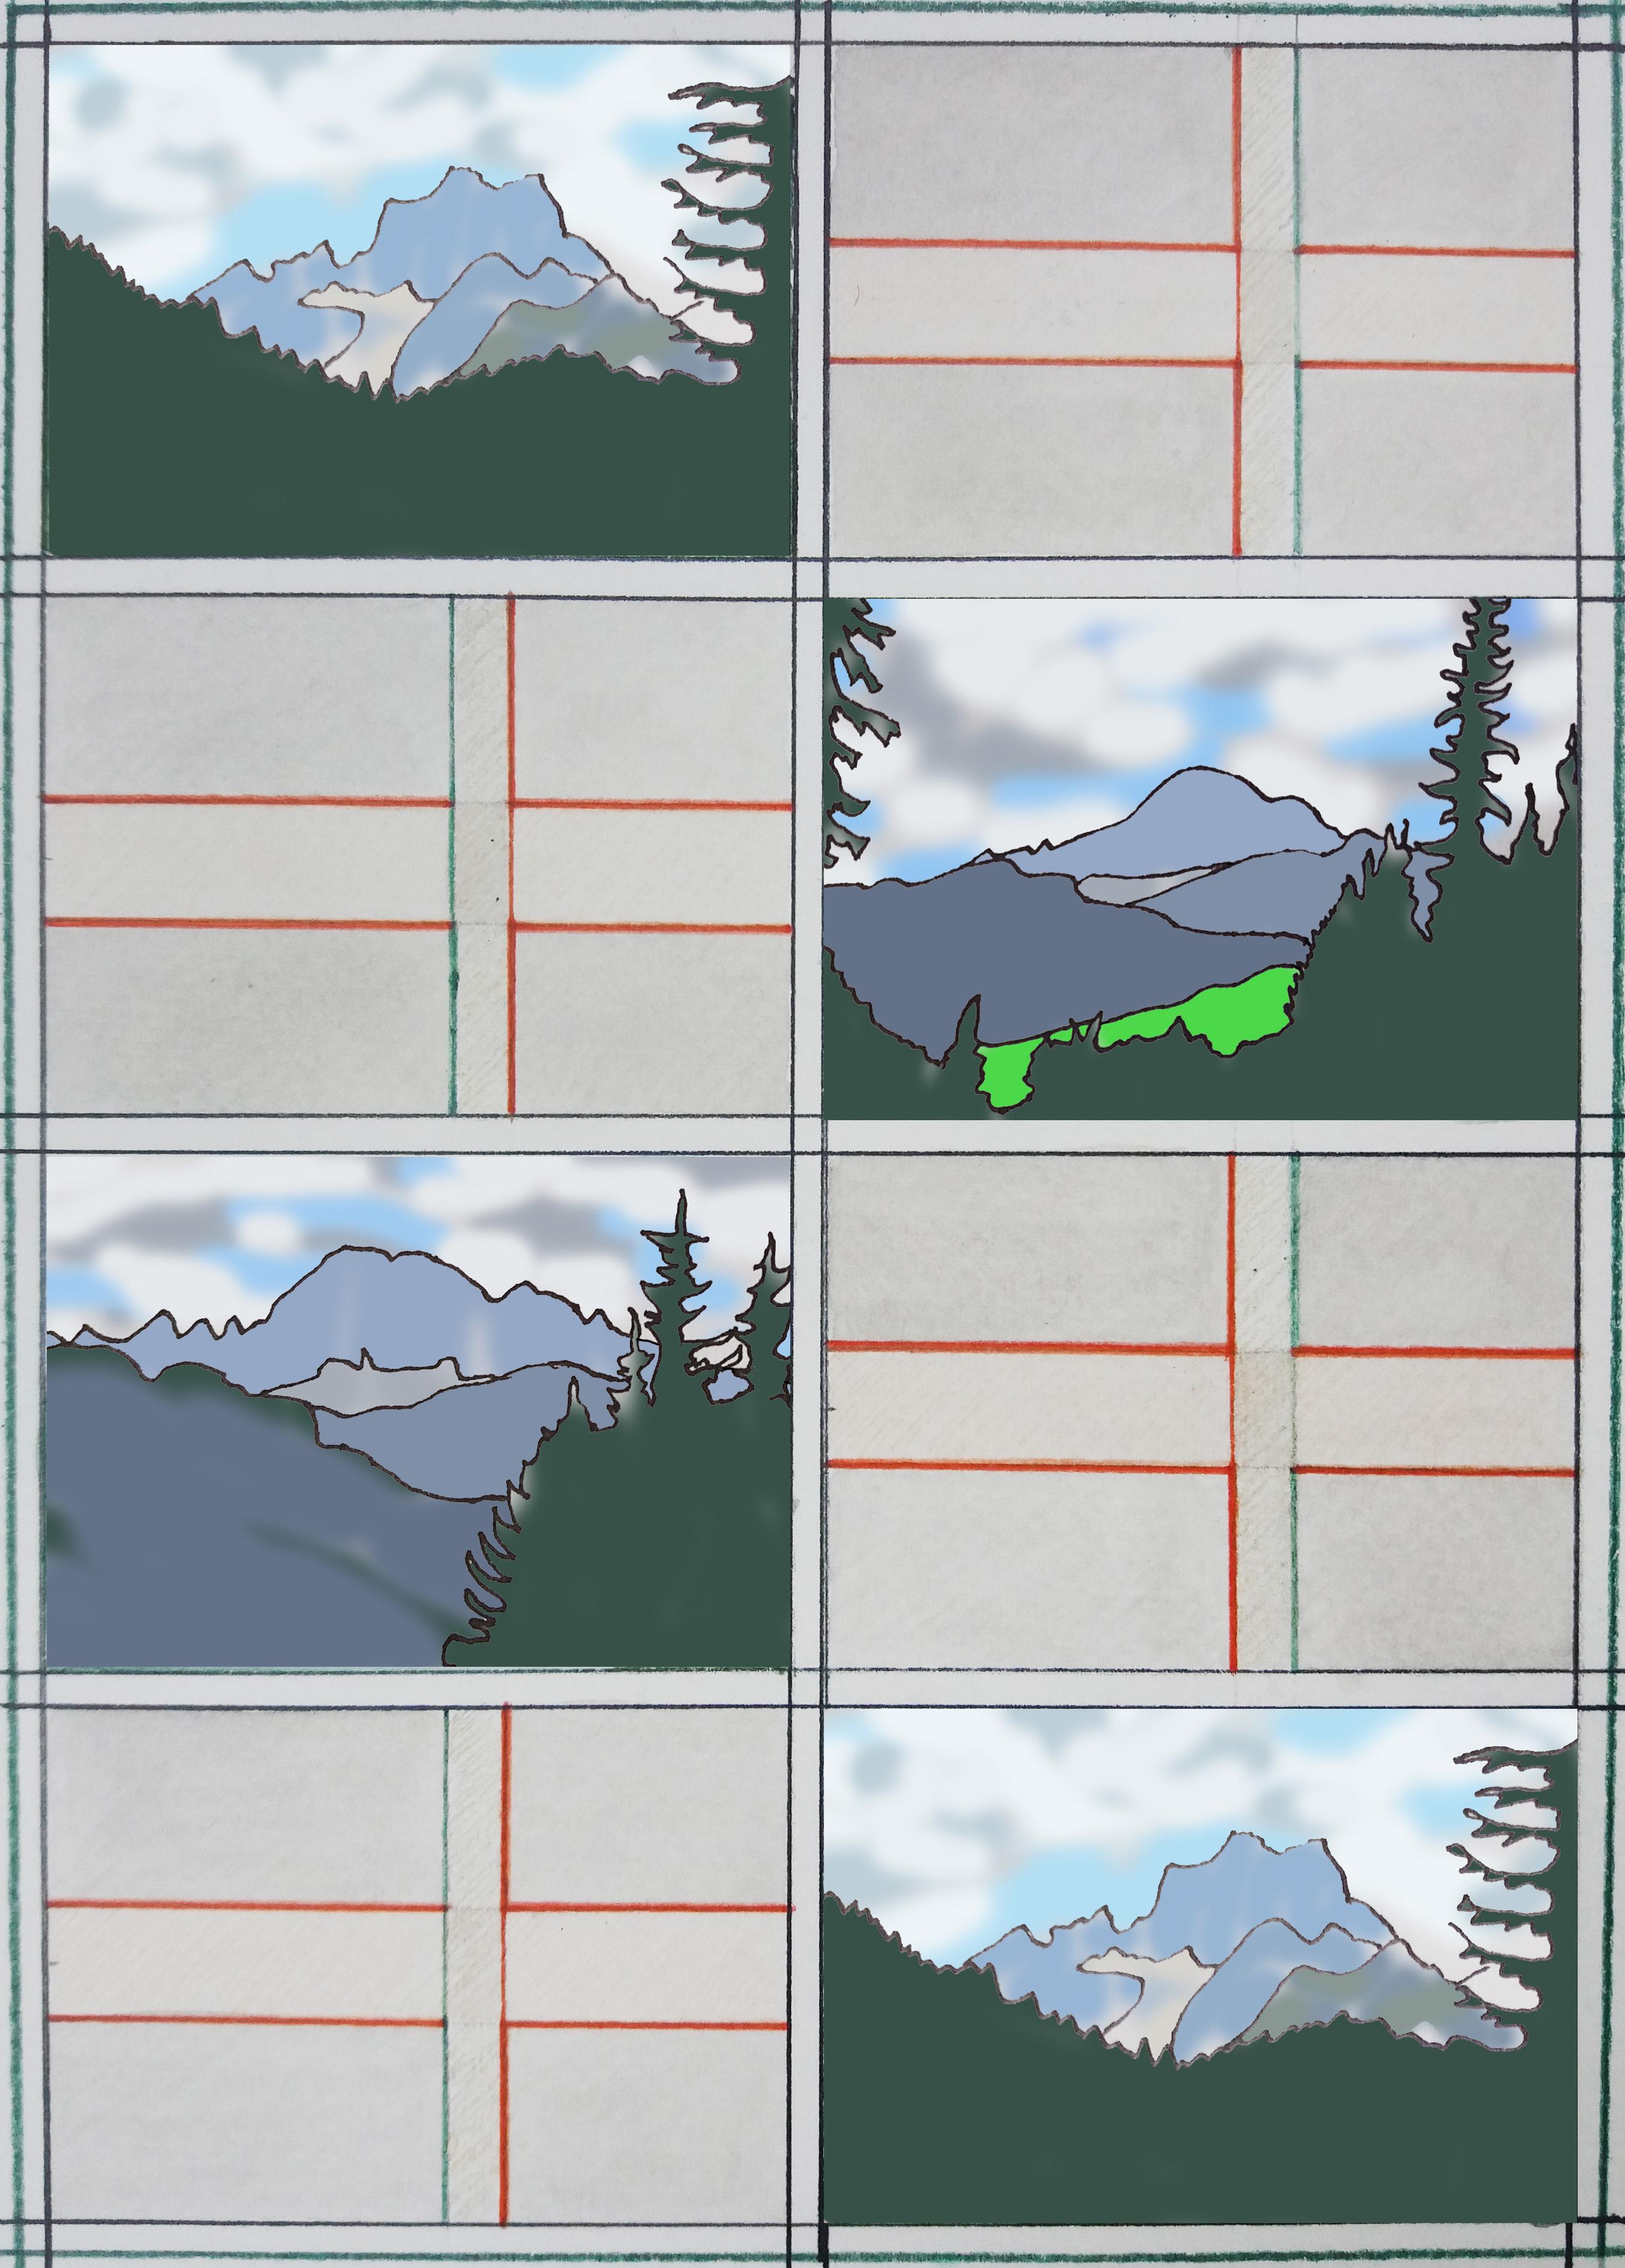 Pattern prova